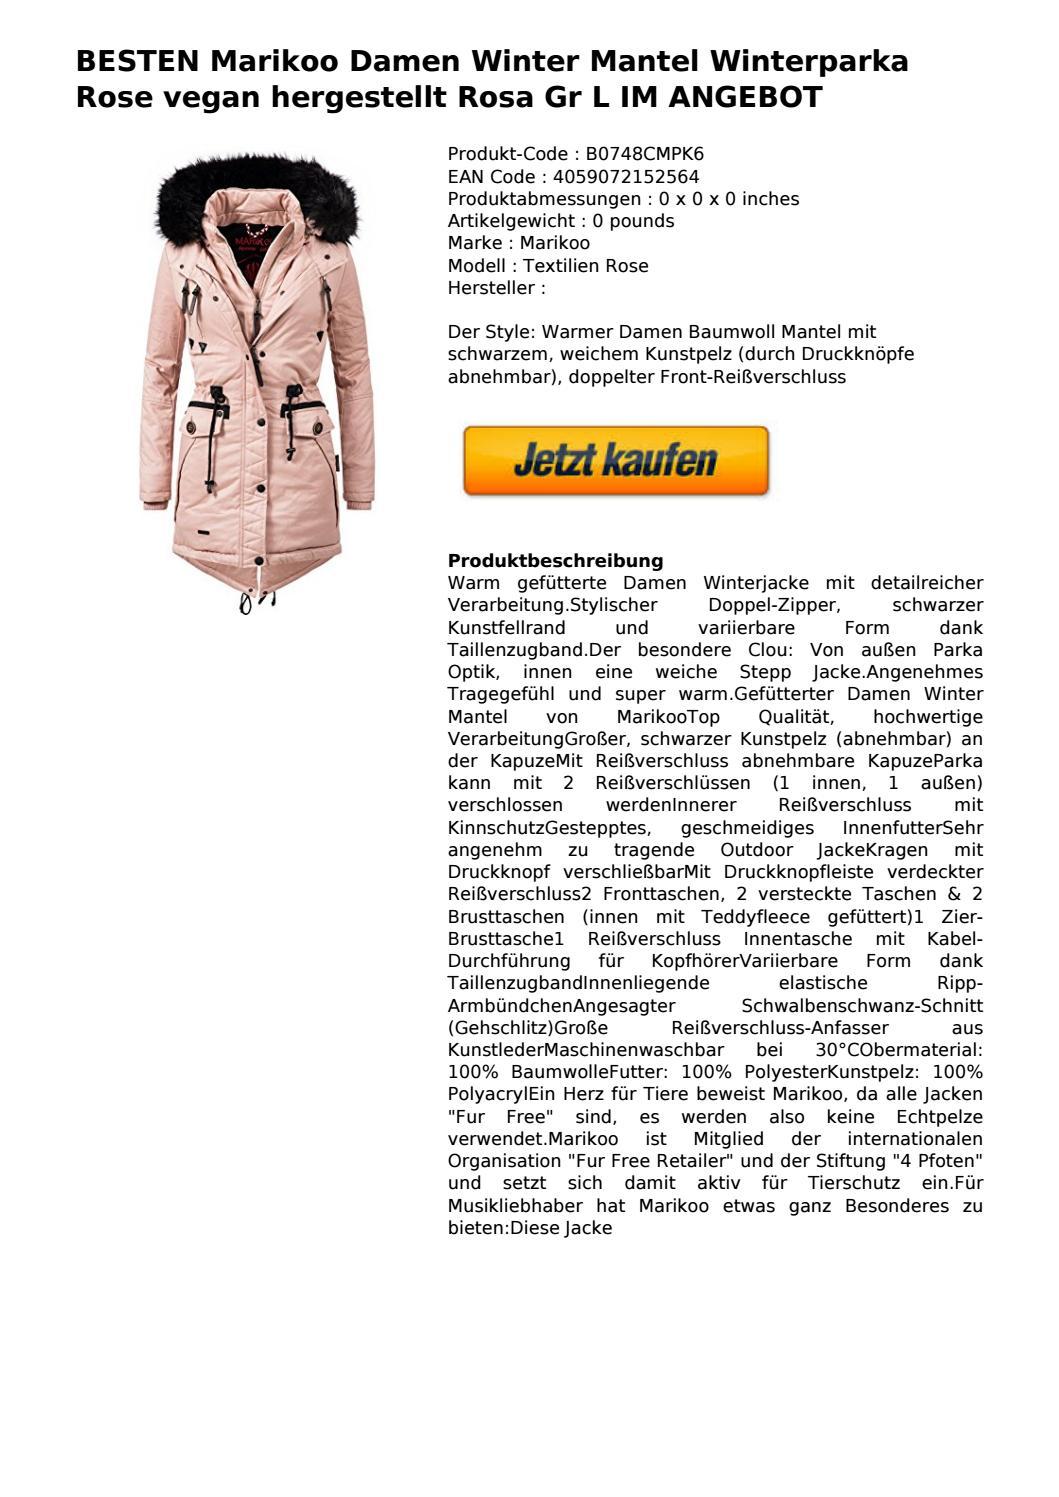 Marikoo Rose Mantel Besten Damen Winterparka Vegan Winter 0N8wOvmn